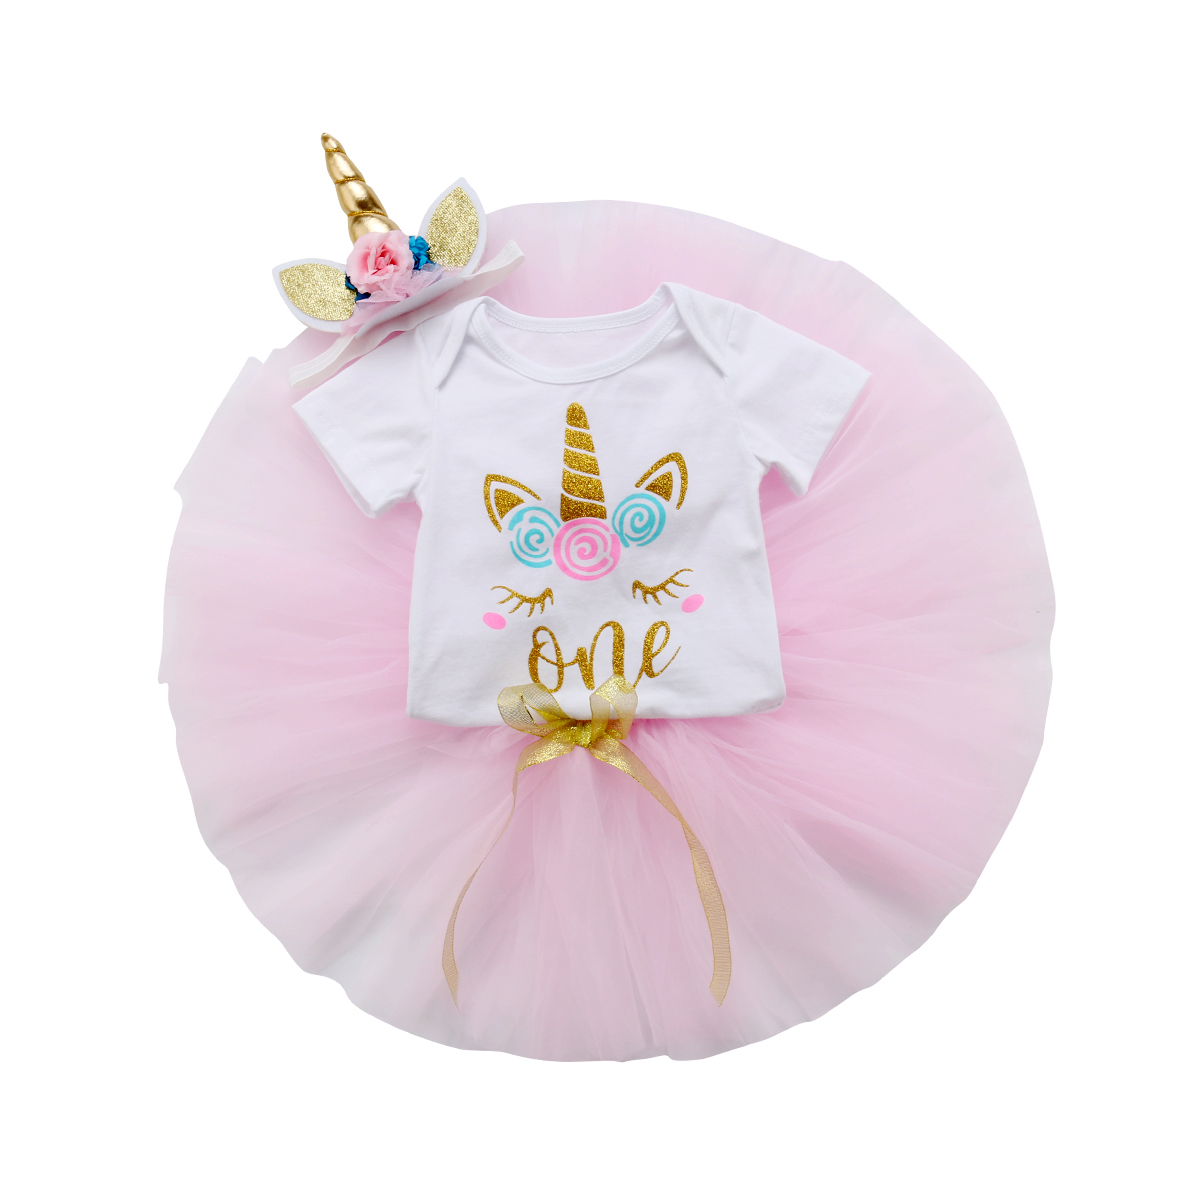 Lovely Newborn Baby Girl Unicorn Romper Tops+Tutu Skirted Headband 3PCS Outfits Princess Baby Clothing Set 0-24M цена